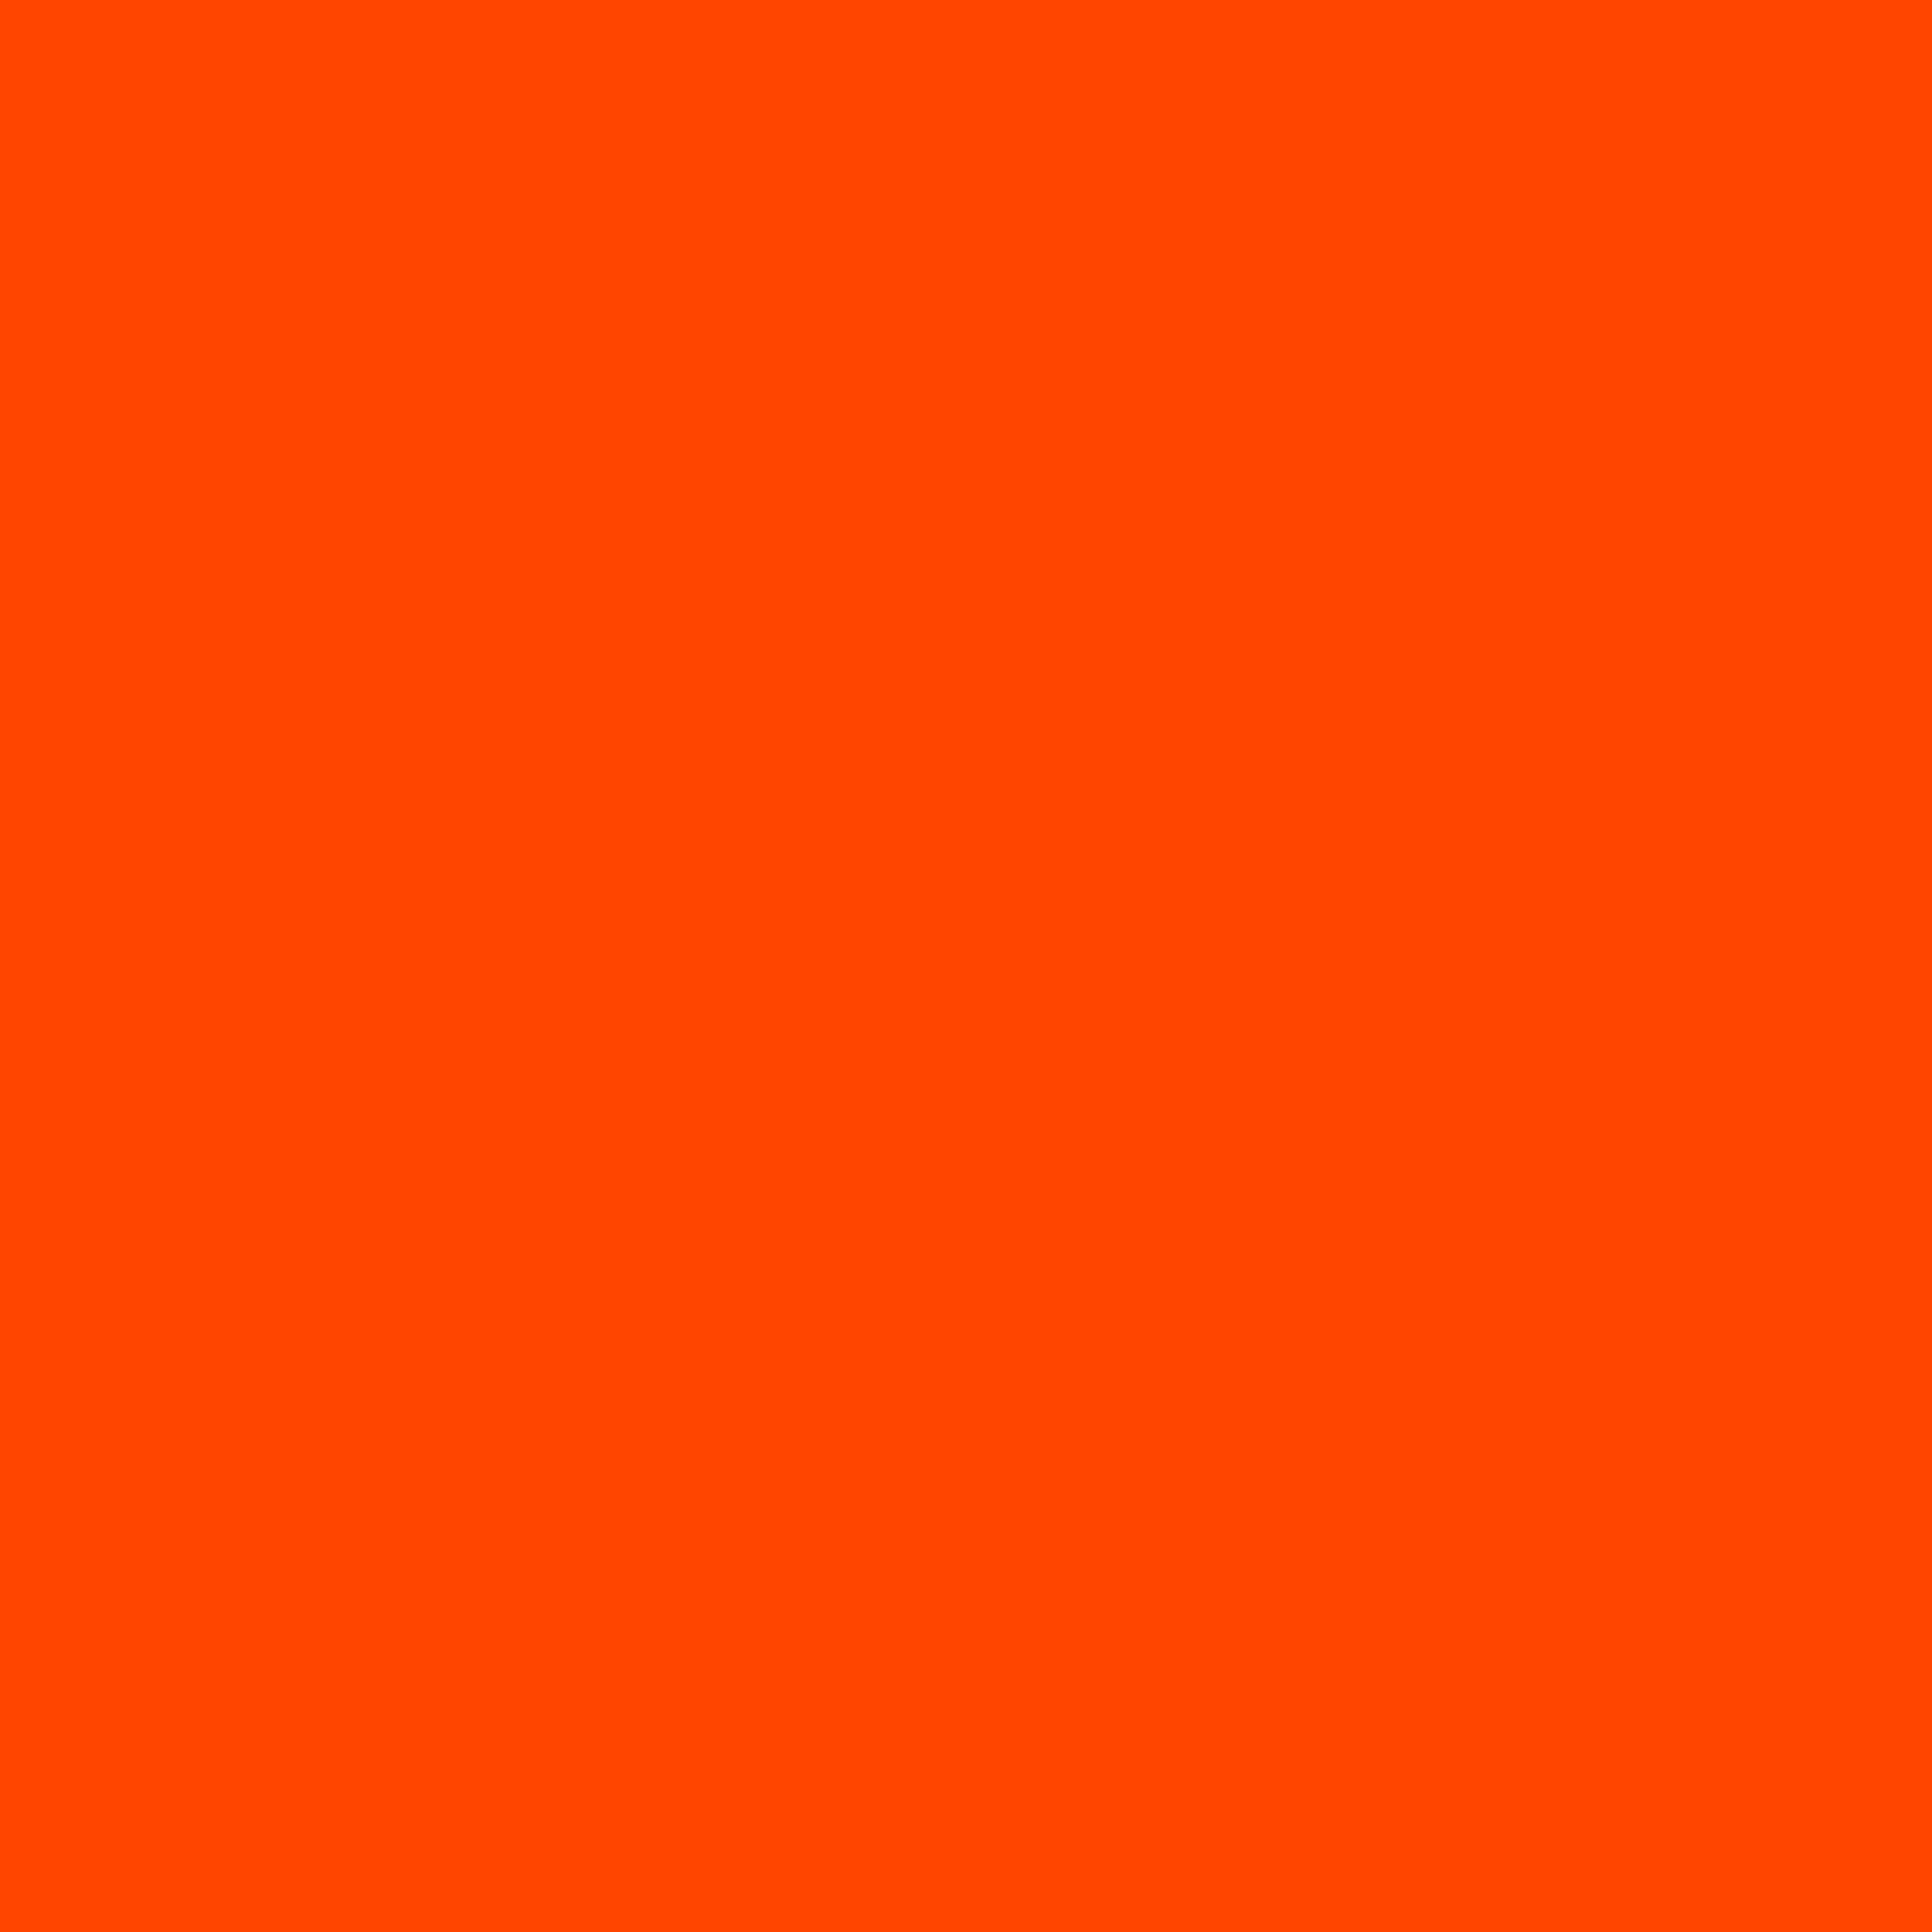 3600x3600 Orange-red Solid Color Background